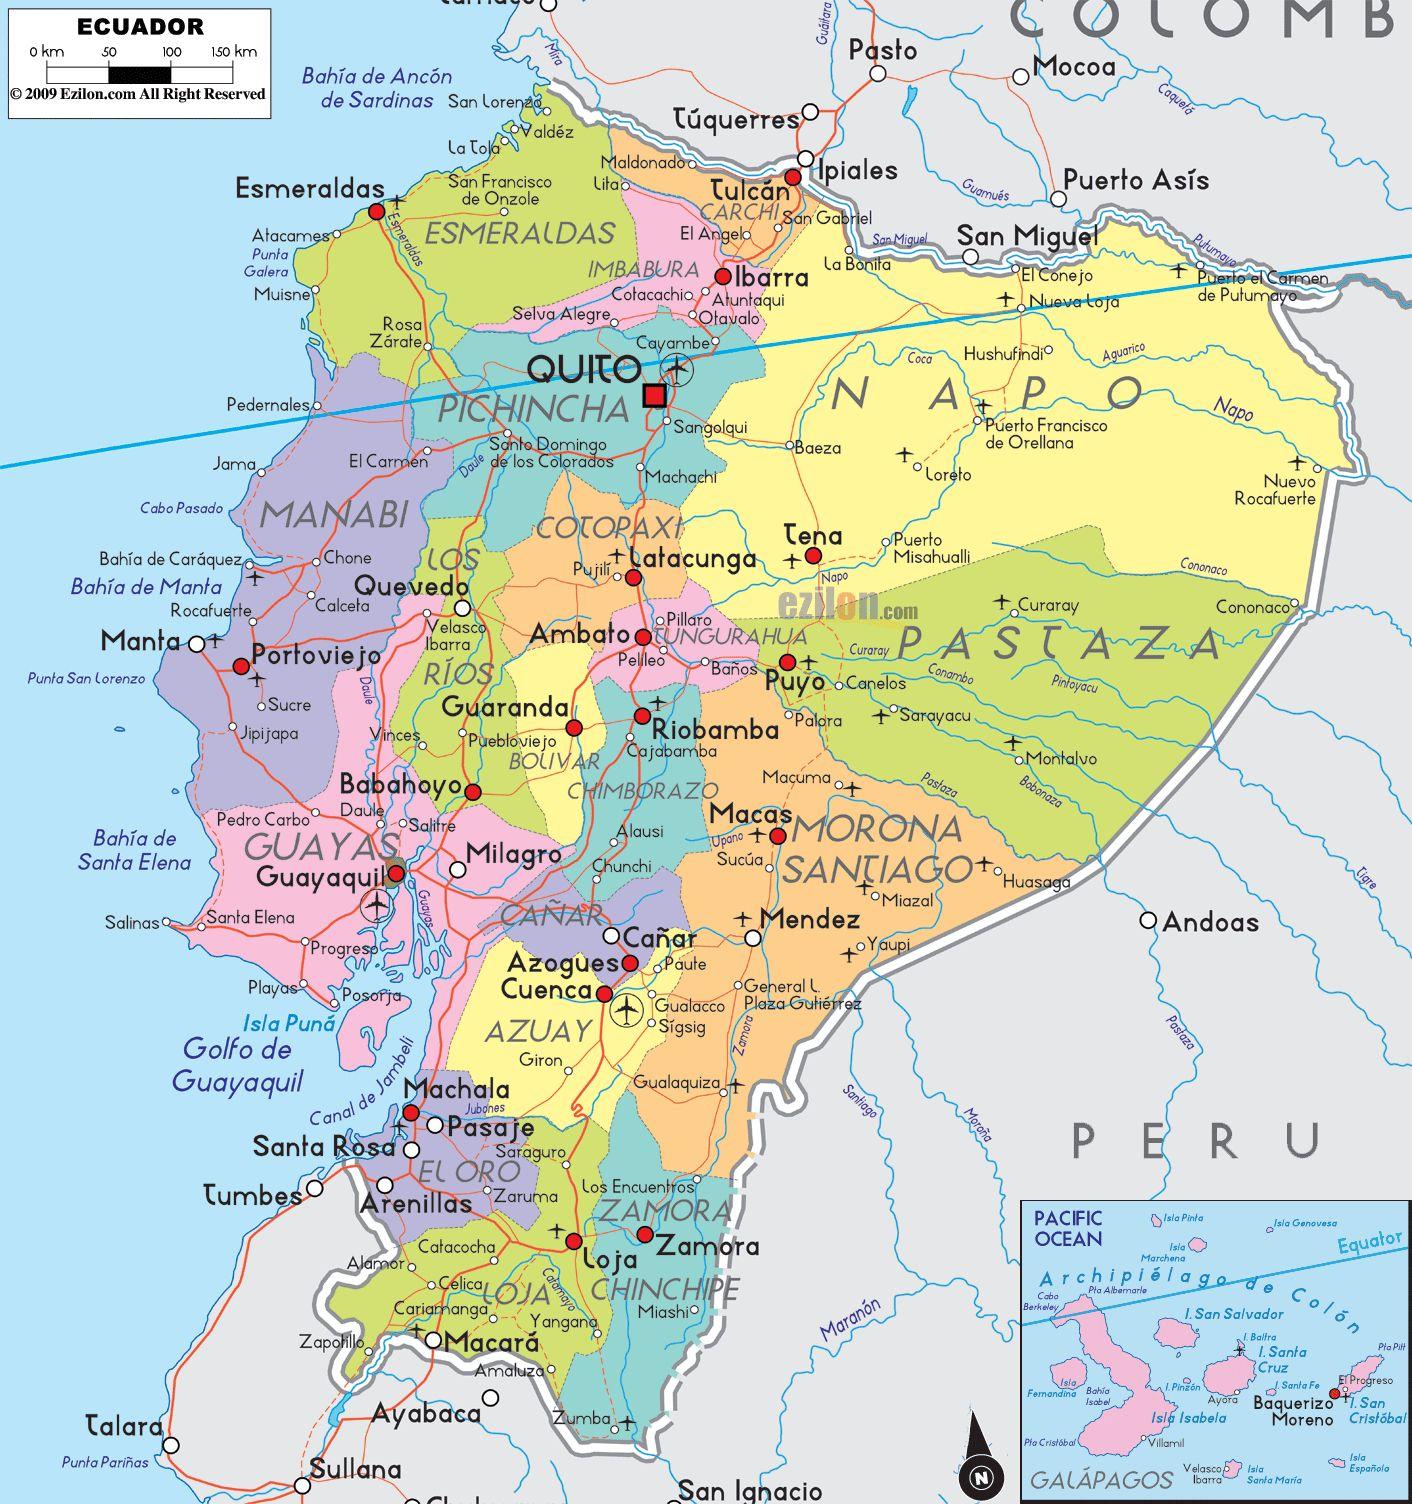 South America Map Galapagos Islands.Ecuador Ecuador Pinterest Ecuador Ecuador Map And Map